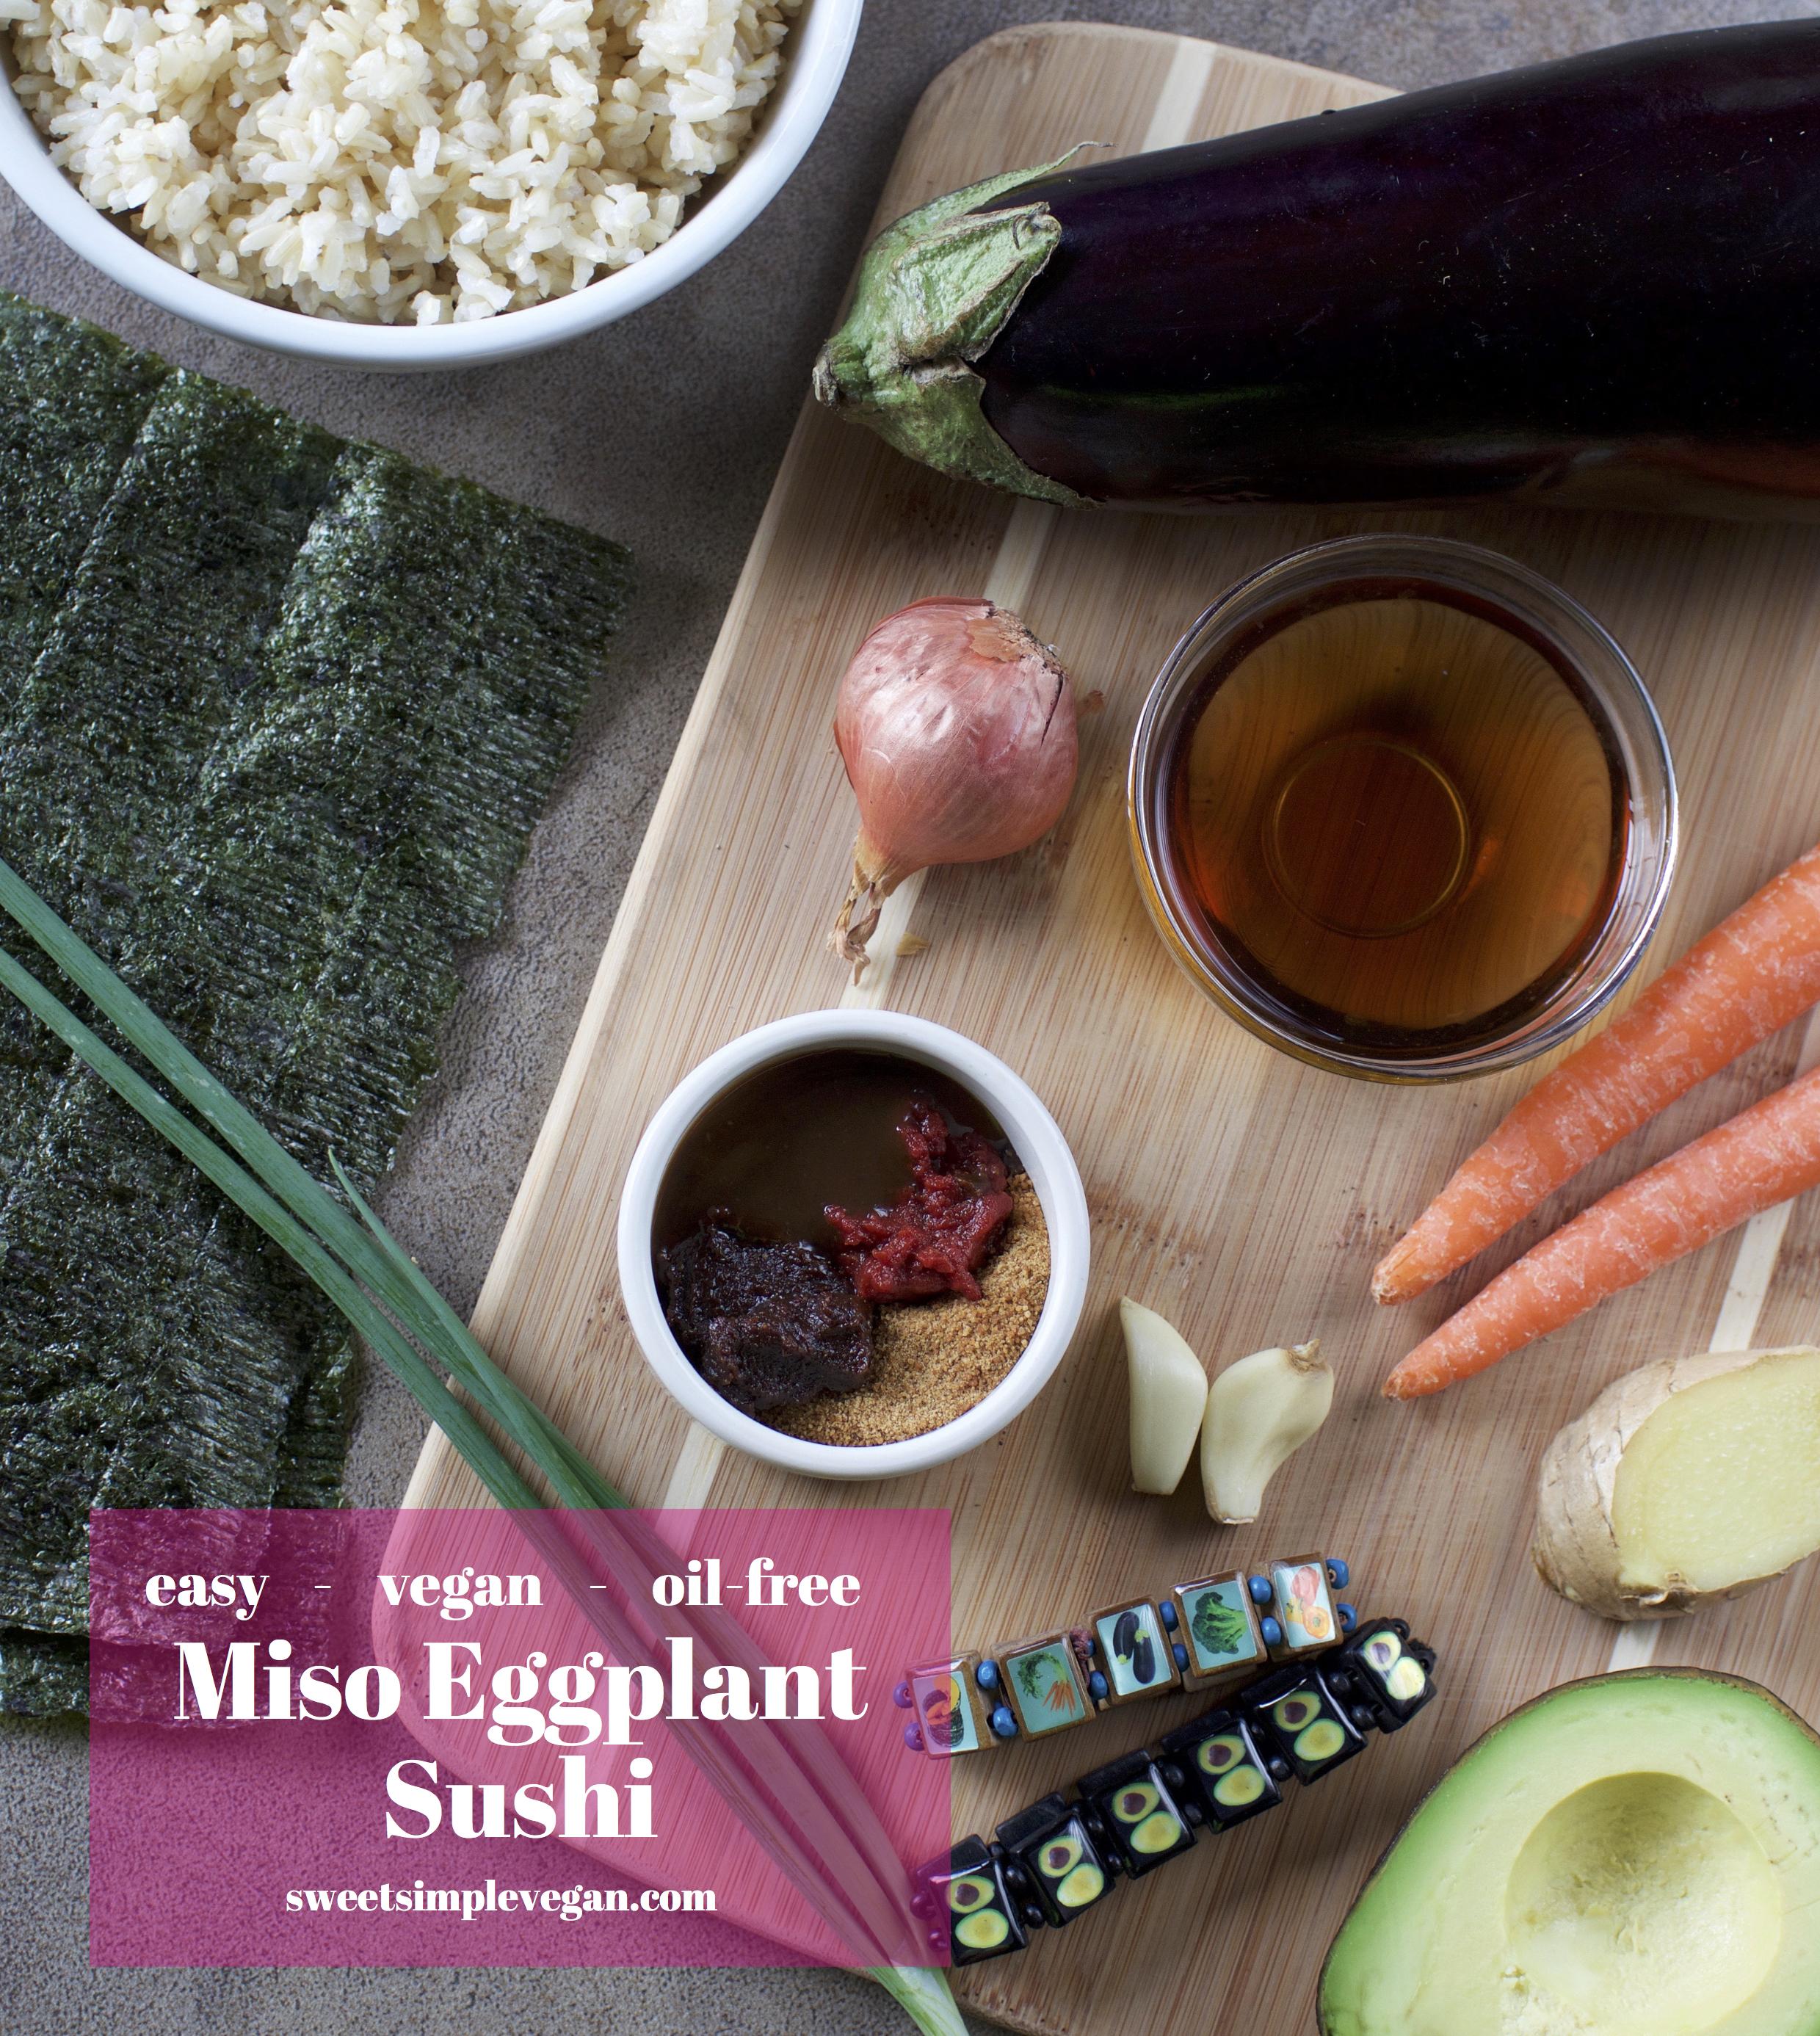 Vegan Miso Eggplant Sushi {easy, oil-free} sweetsimplevegan.com